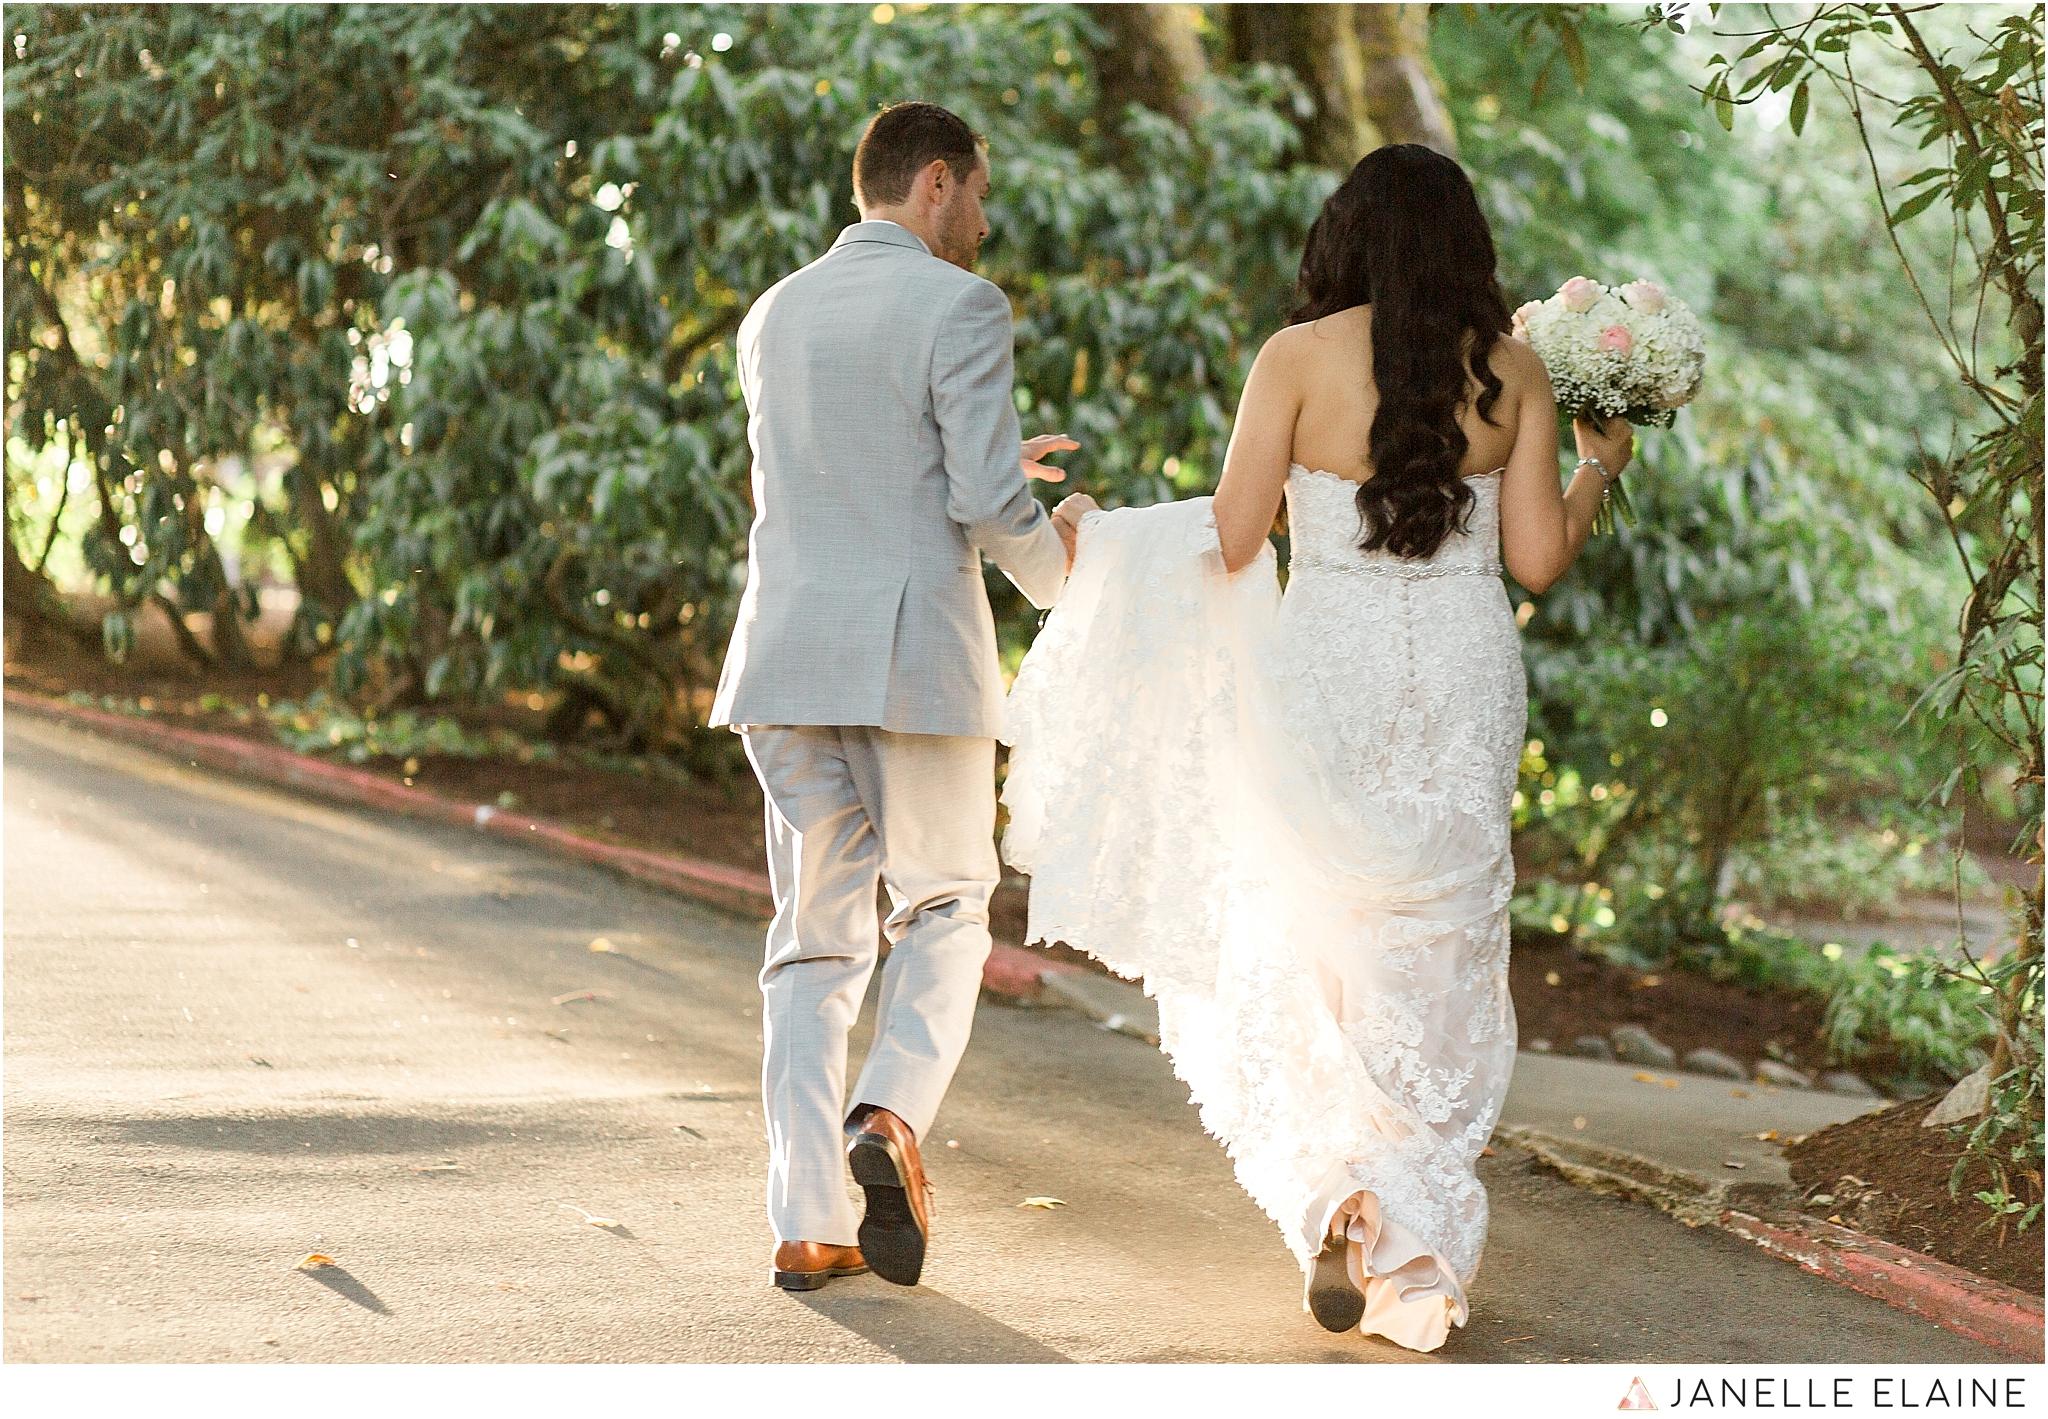 janelle elaine photography-professional wedding photographer-seattle-bellevue-robinswood house-234.jpg